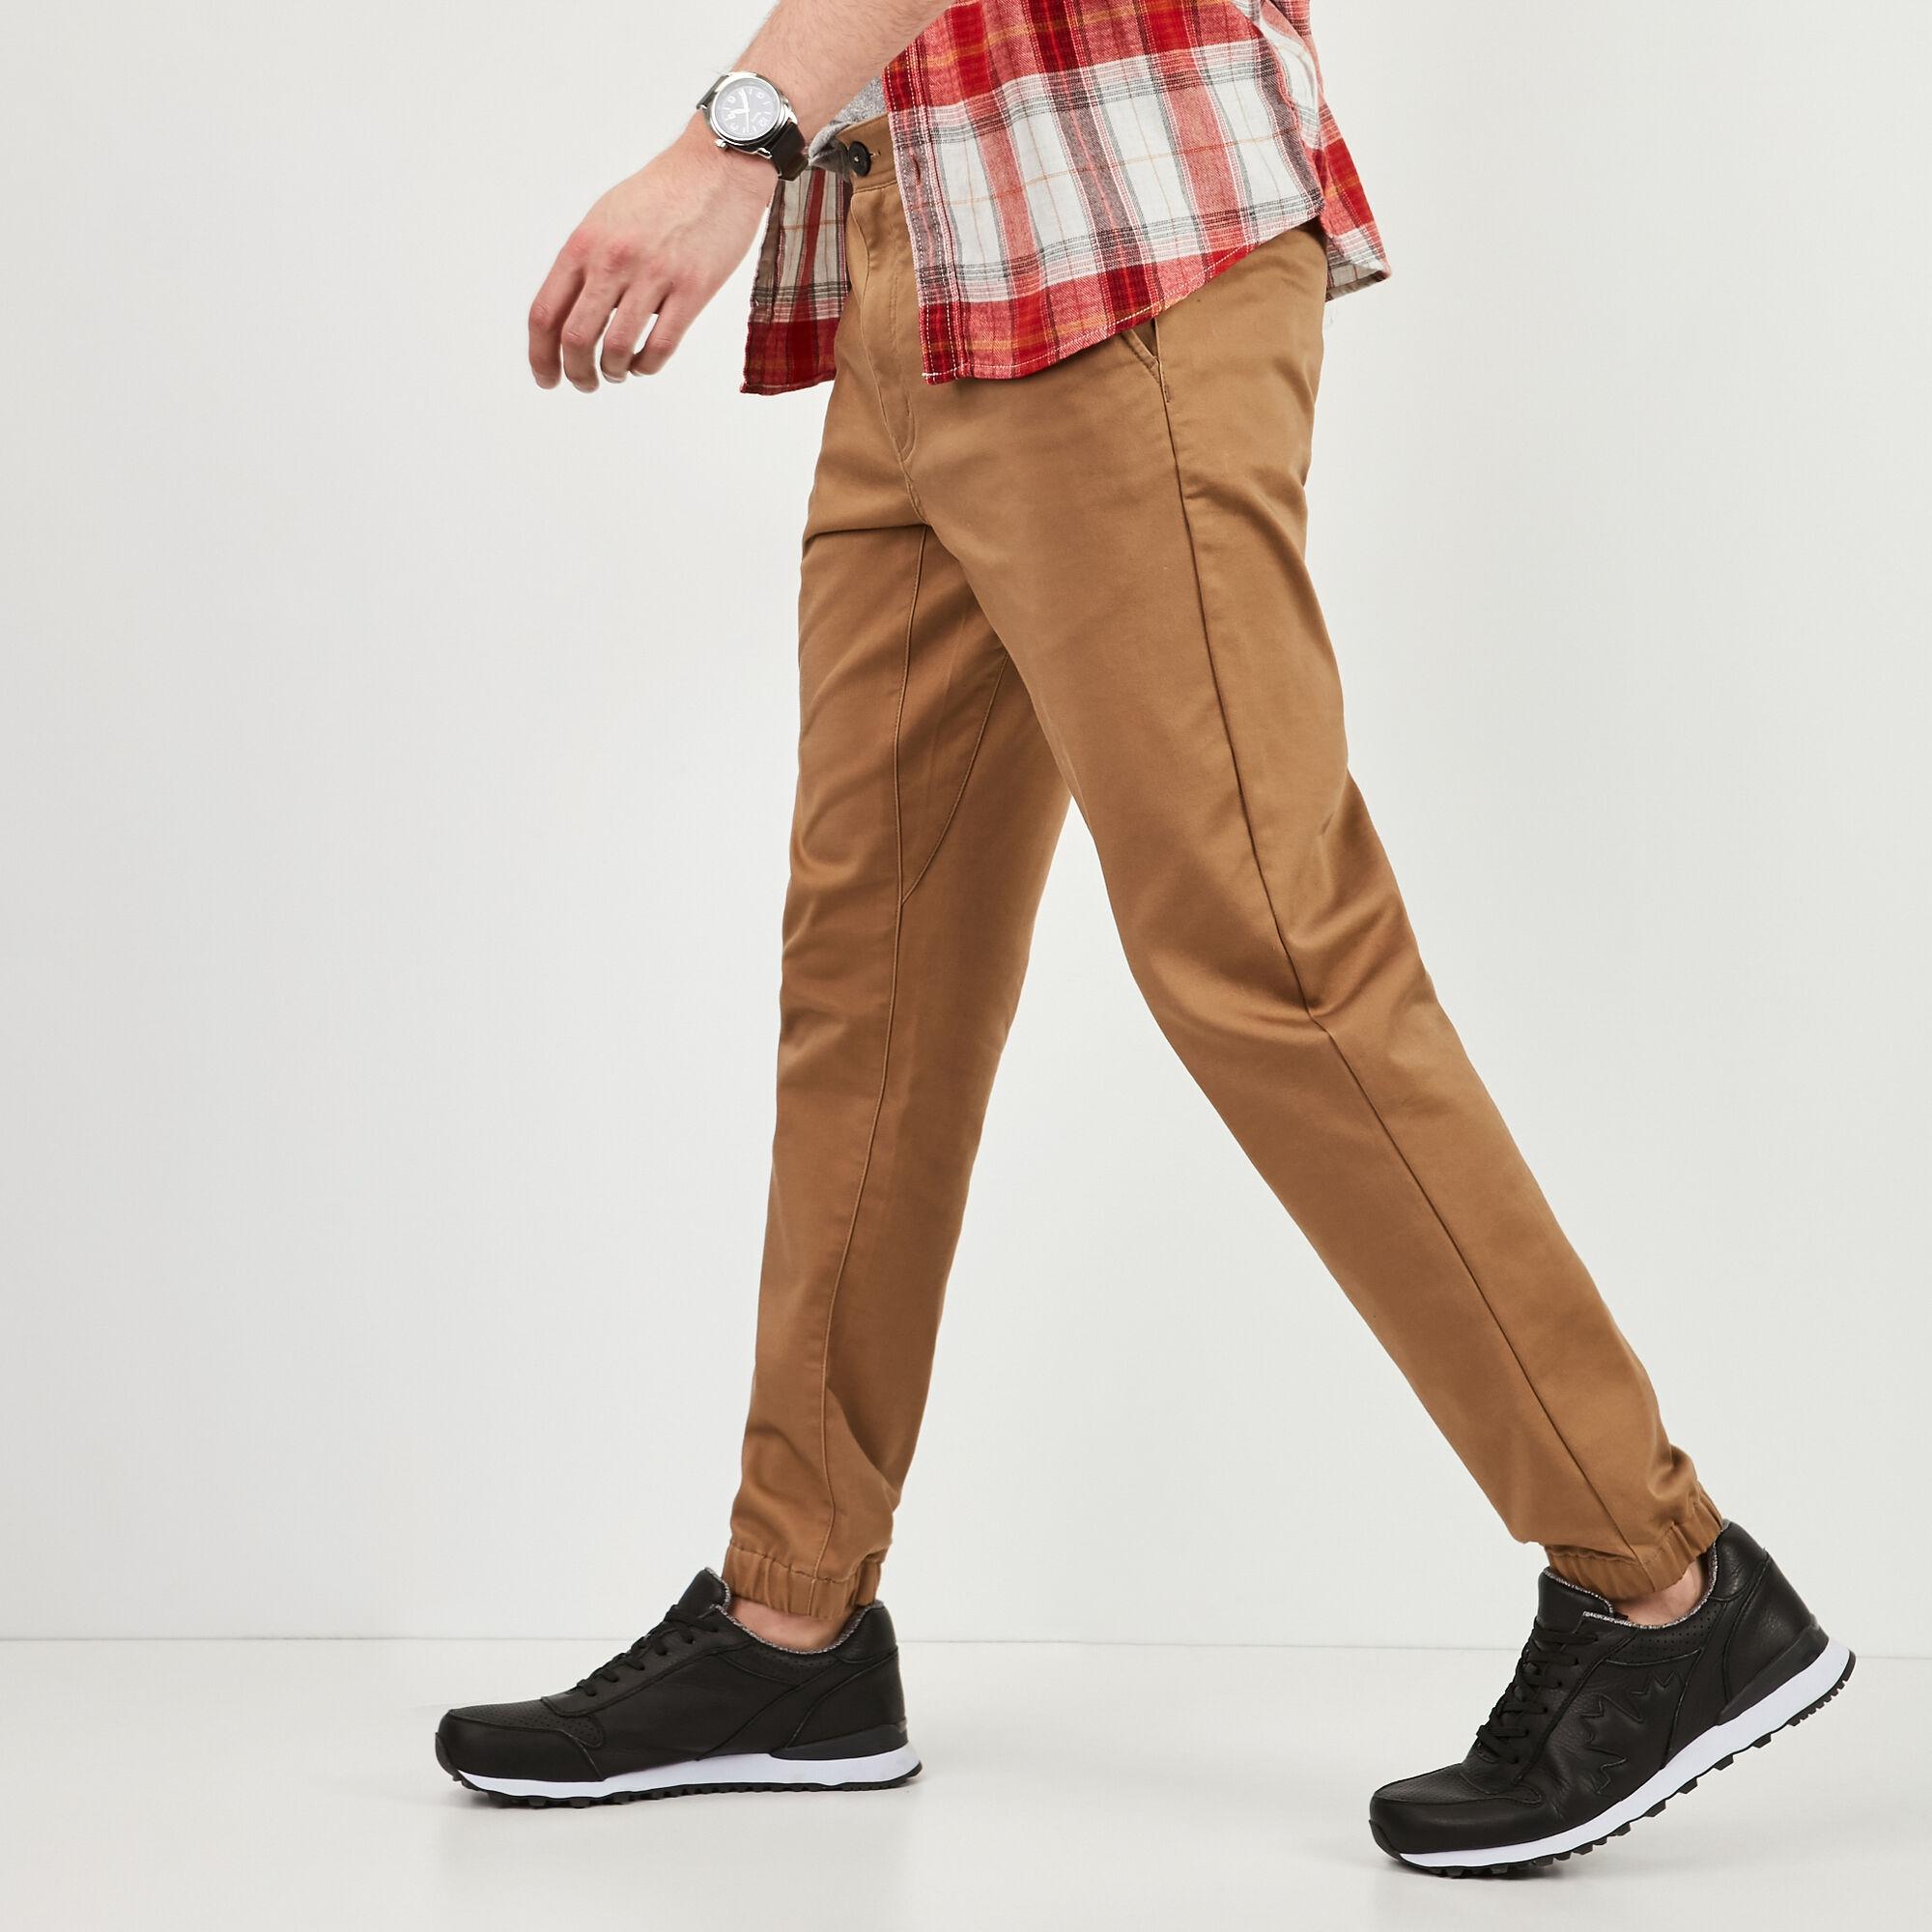 Pantalon De Jogging Forrester